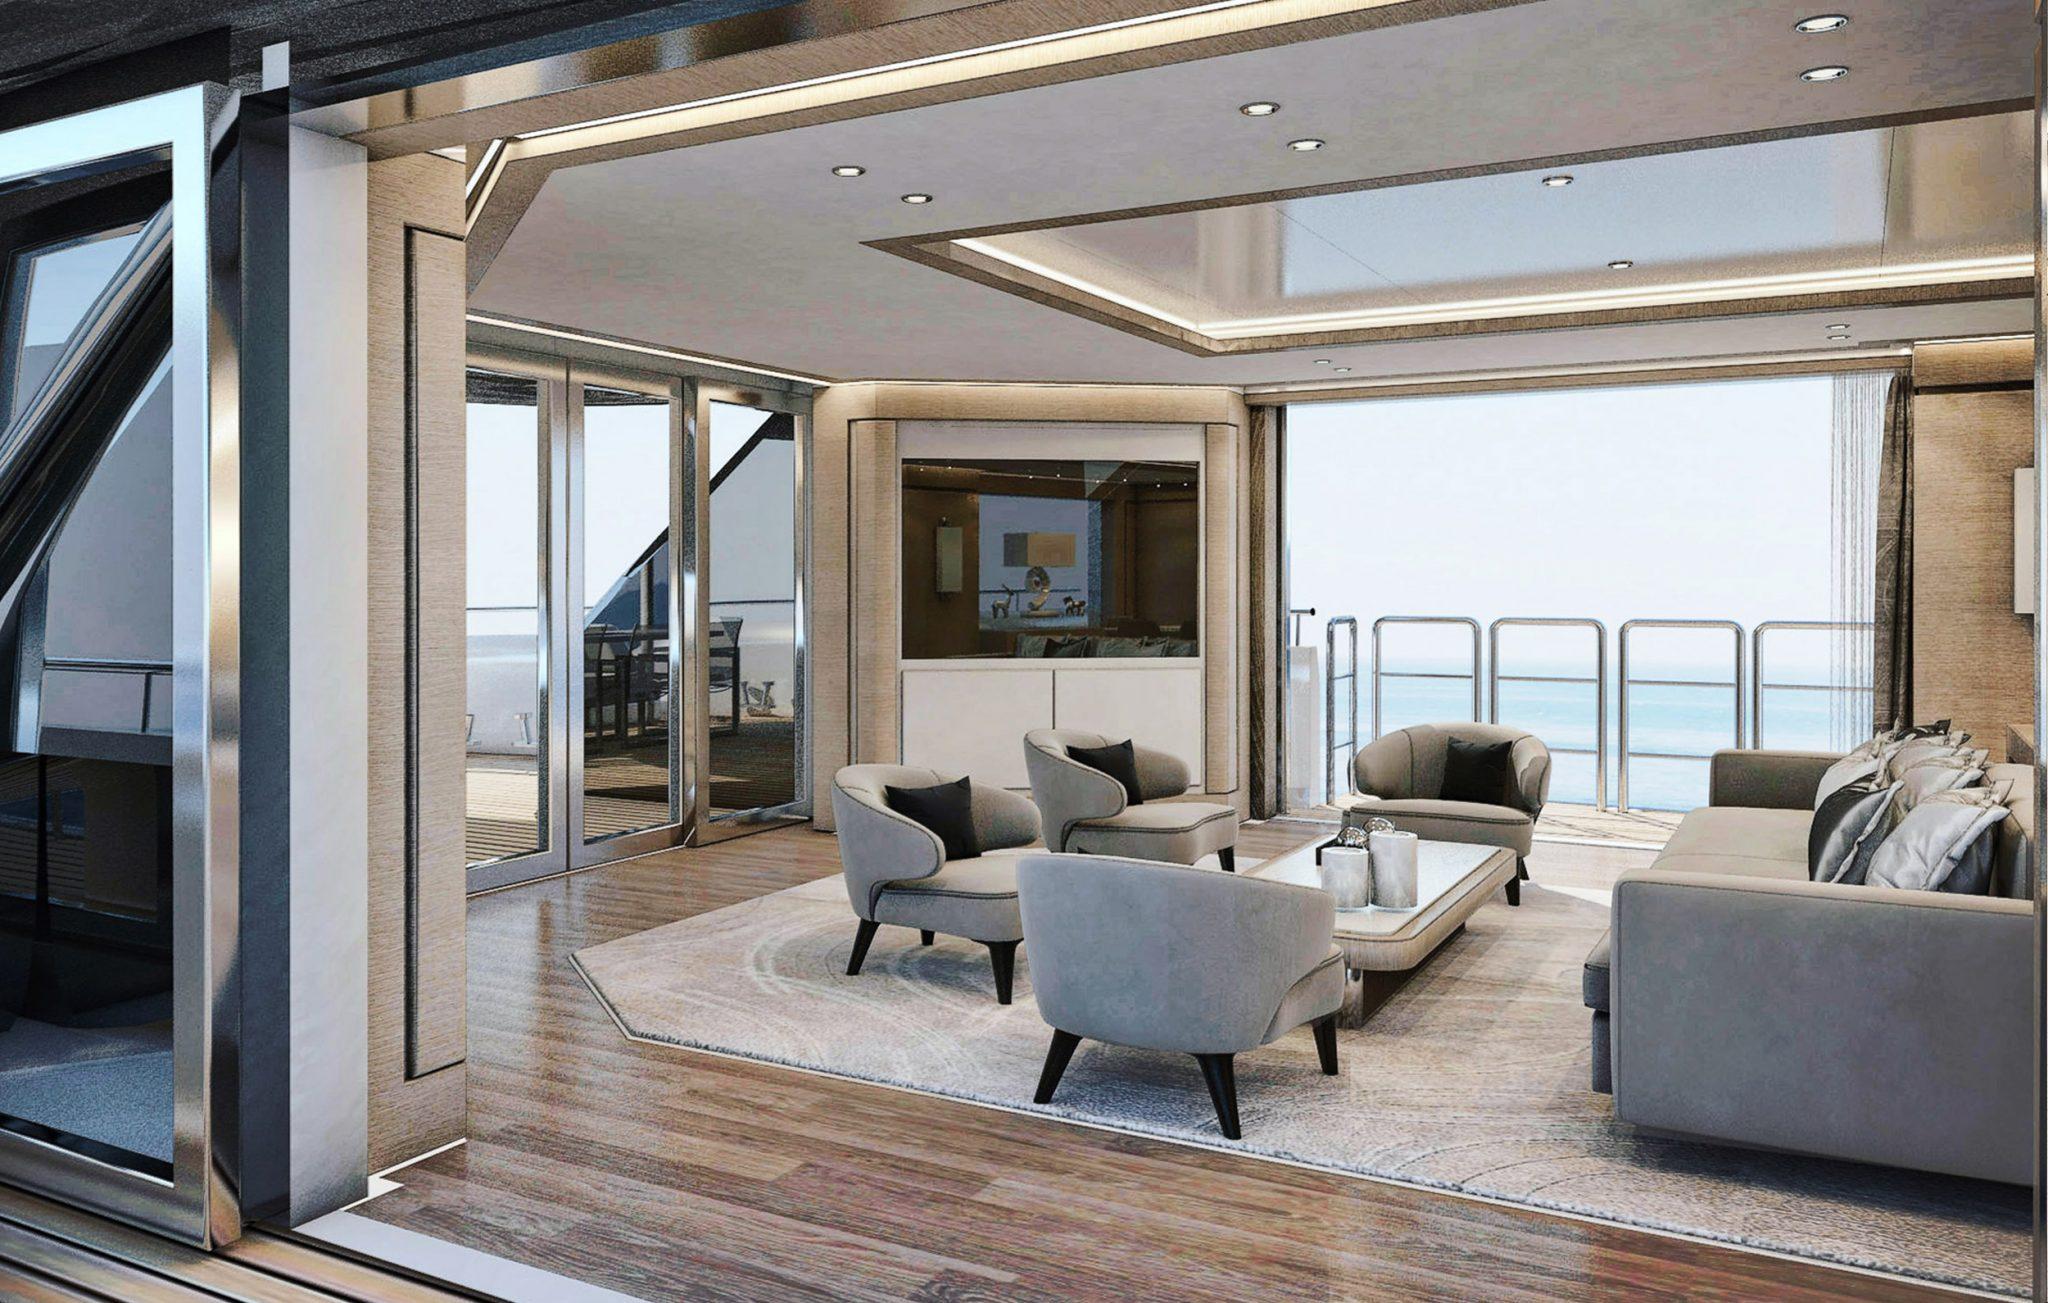 Sea Star luxury motor yacht 35 meter motor yacht Mengi Yay yachts Istanbul turkey yacht building